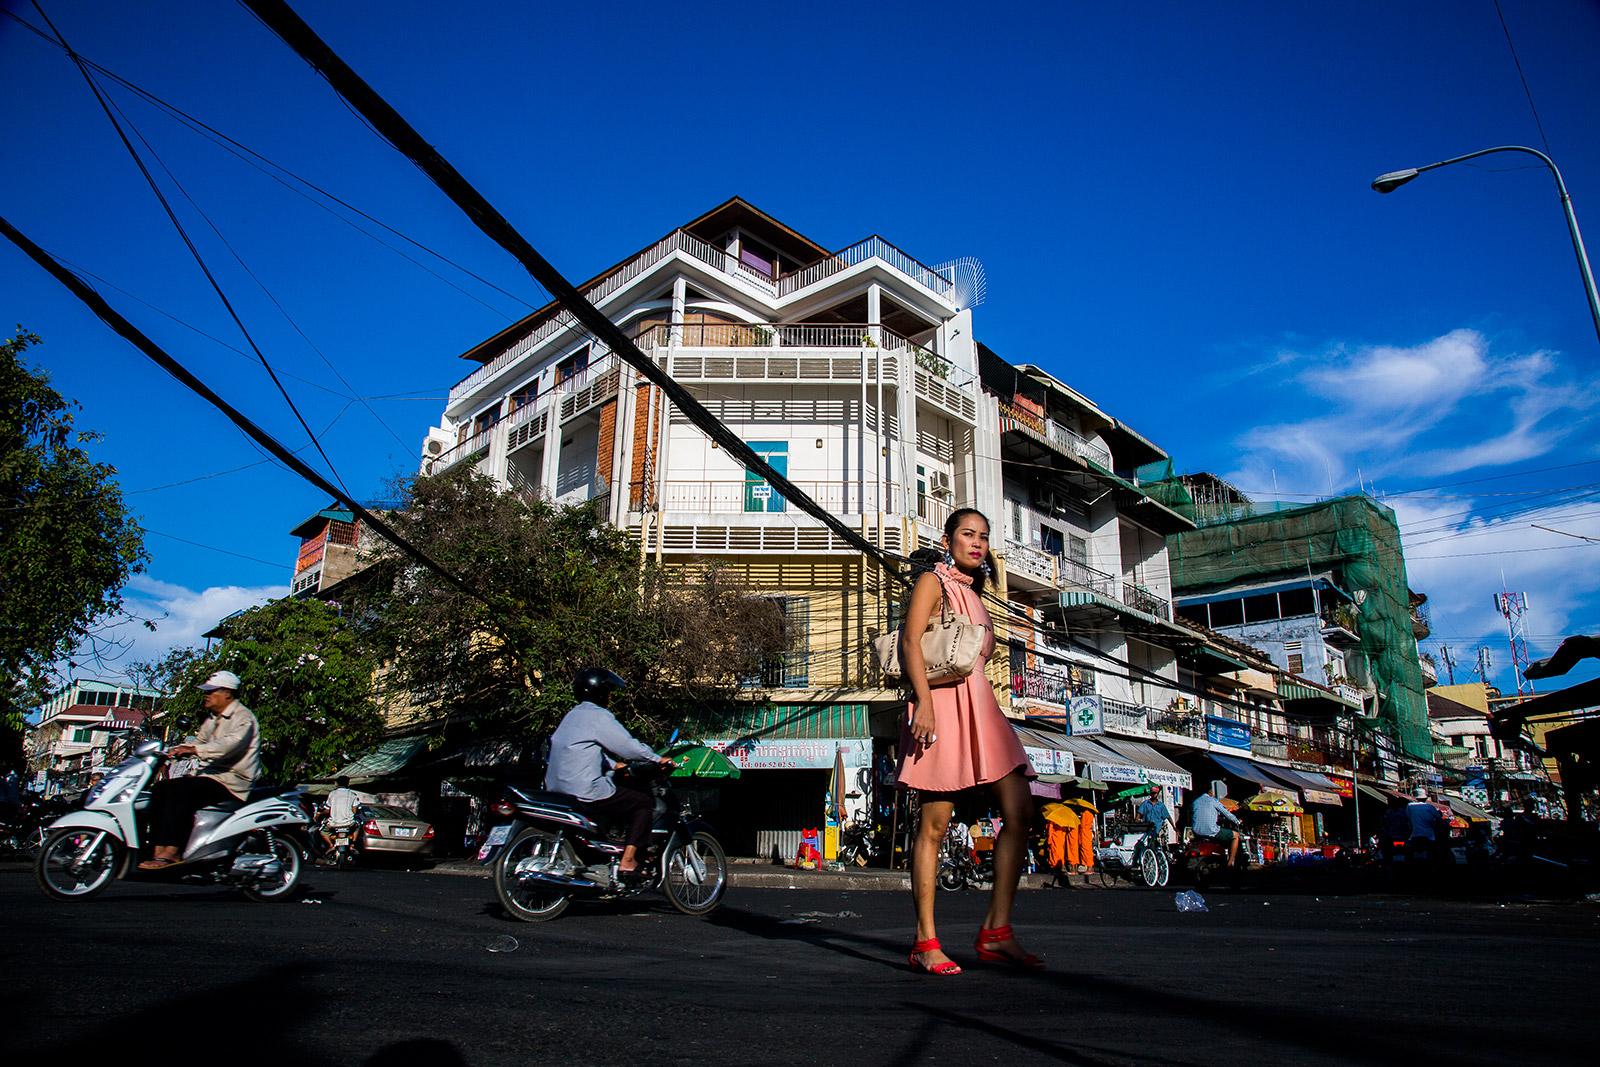 phnom-penh-street-0017.jpg